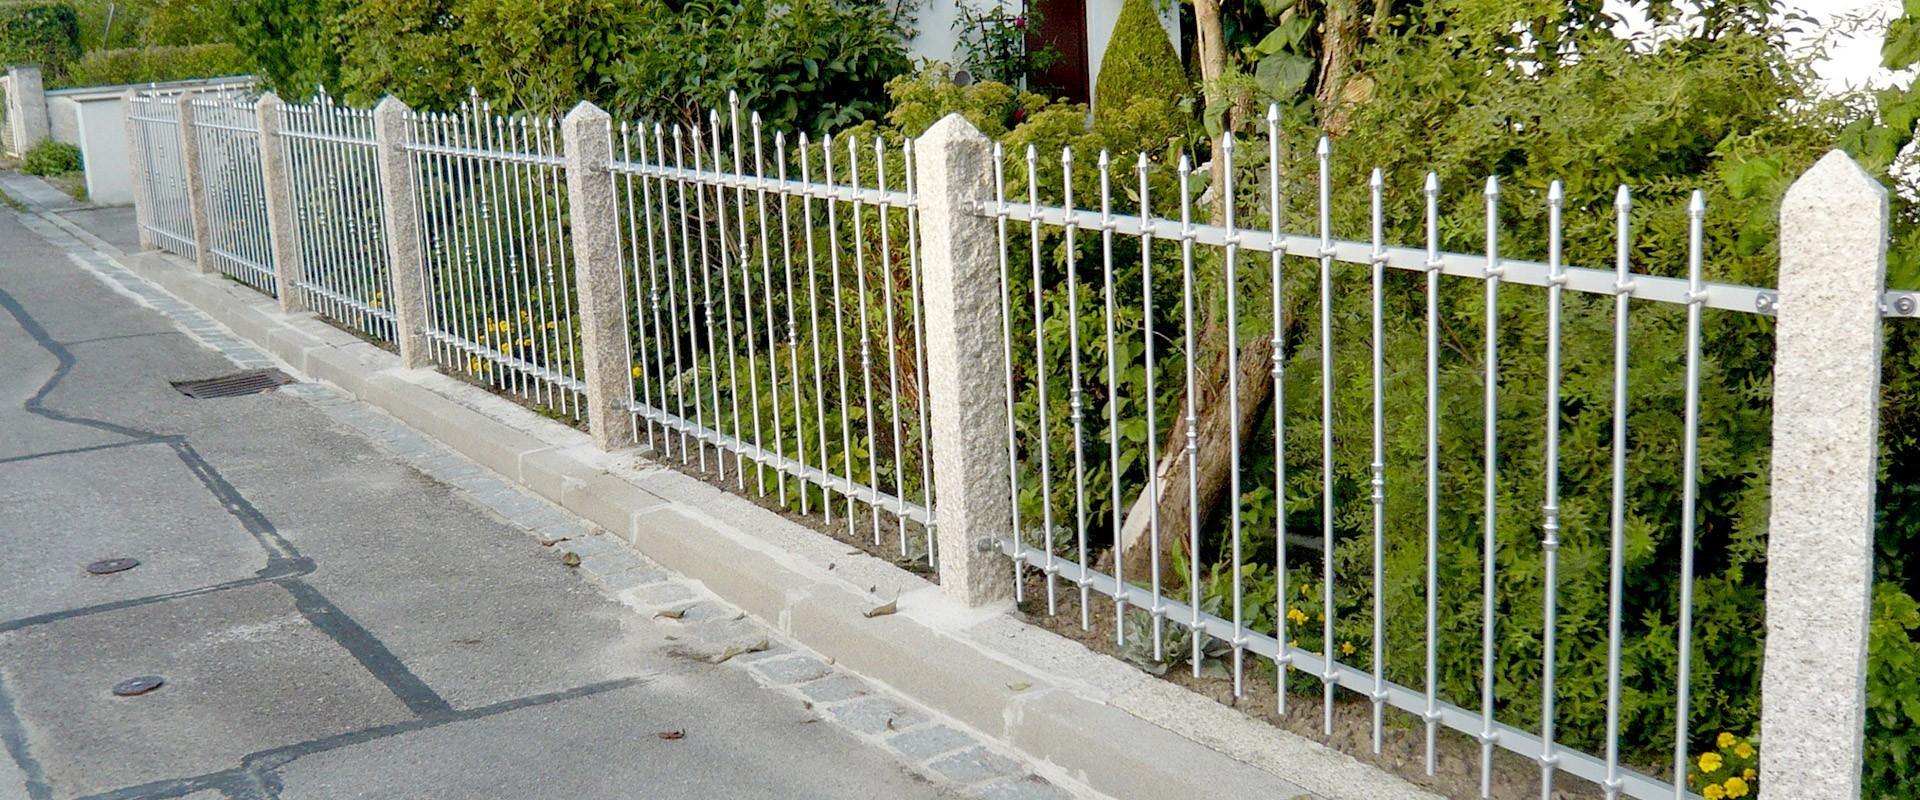 Metallzaun Granitsäule - Zaunelemente Granitpalisaden